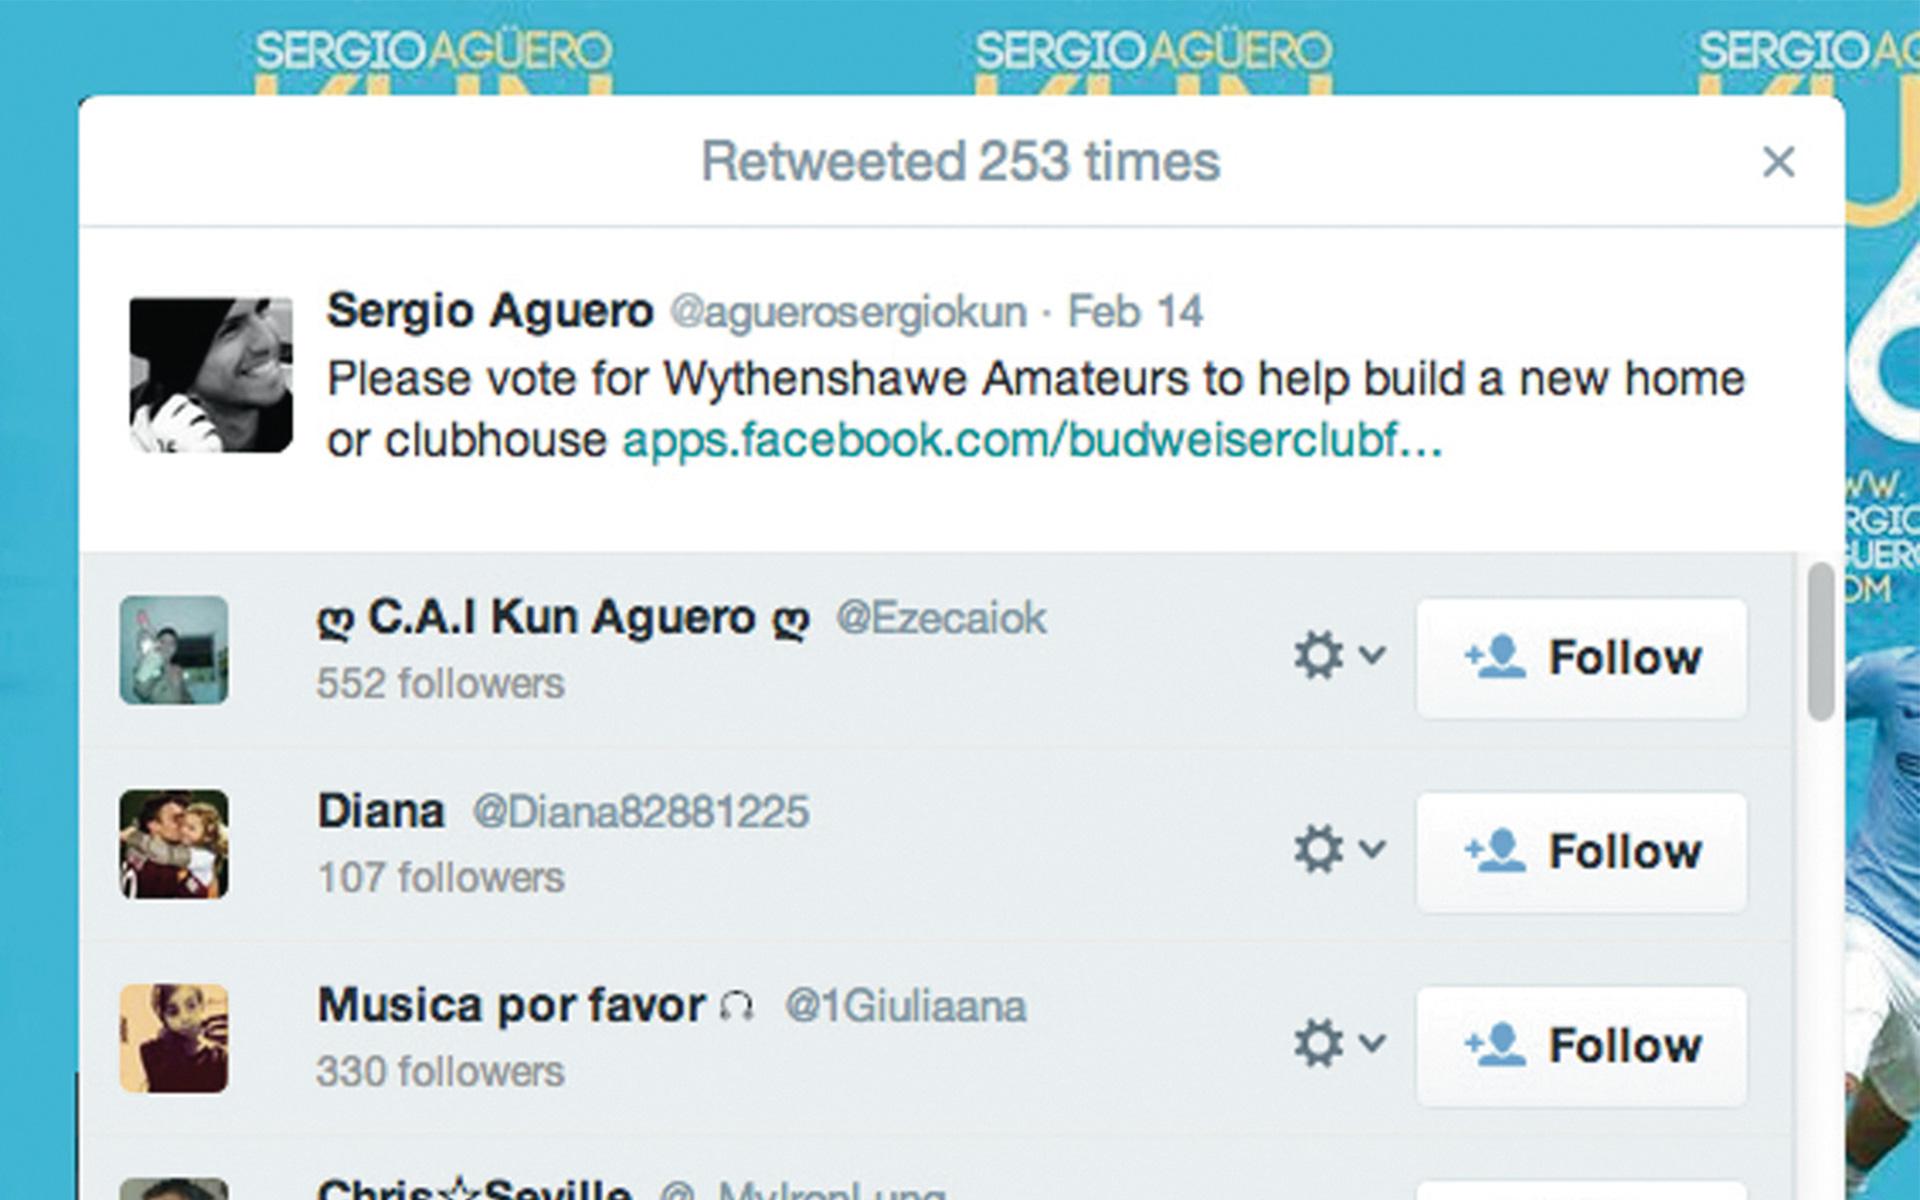 Wythenshawe Amateurs Sergio Aguero tweet